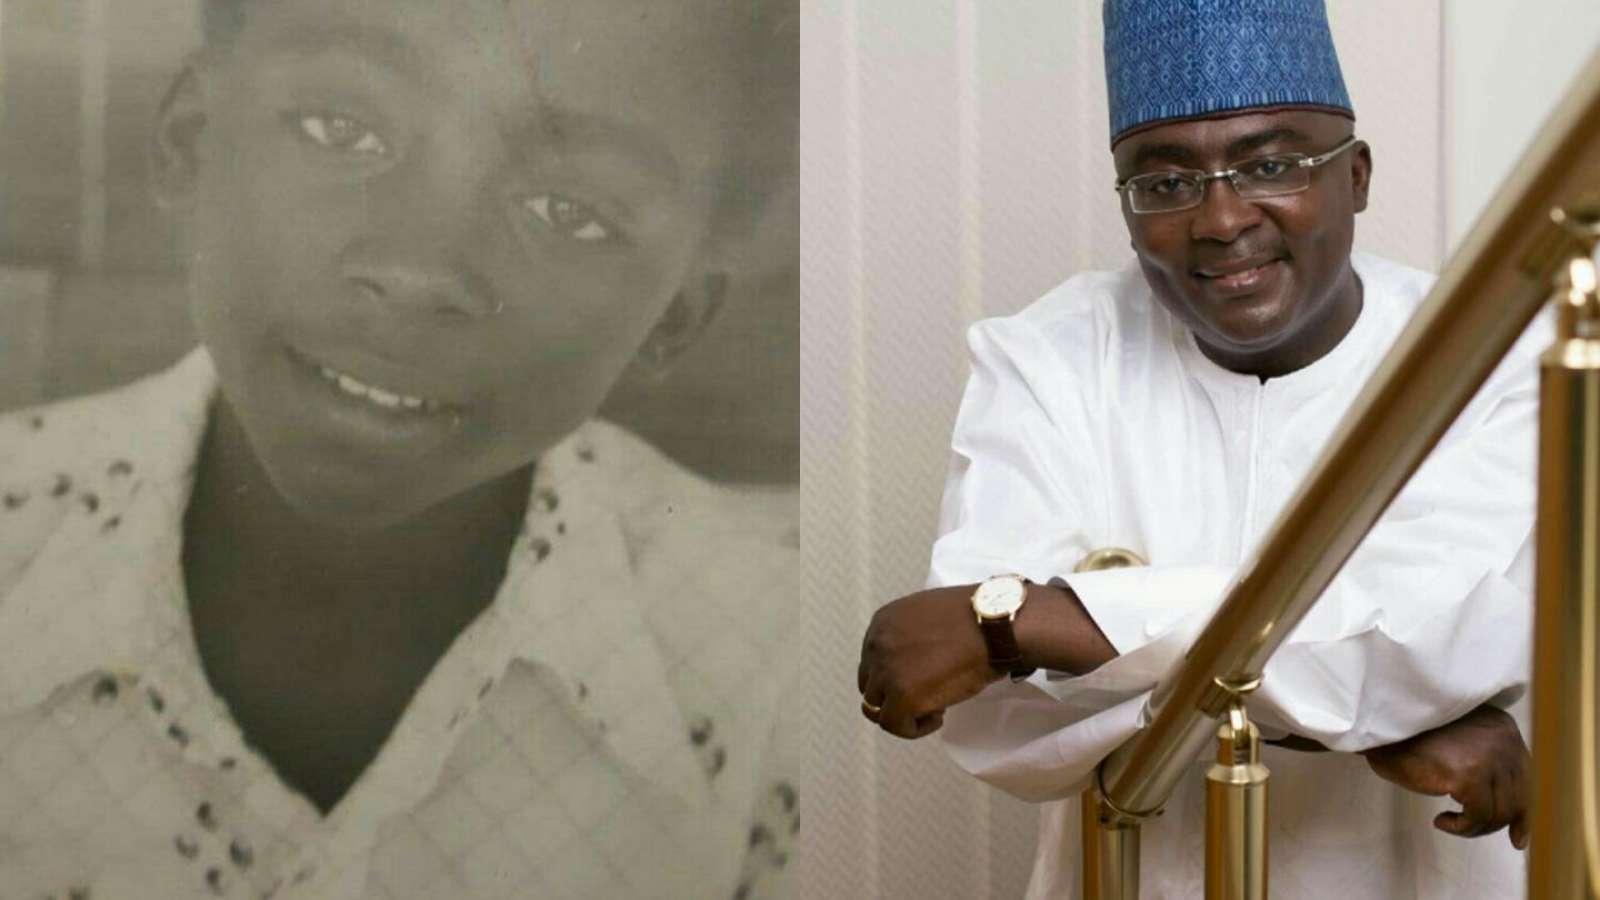 Bawumia at 54: Childhood photos of Dr Bawumia pops up as he celebrates his  birthday(Photos) - GhPage